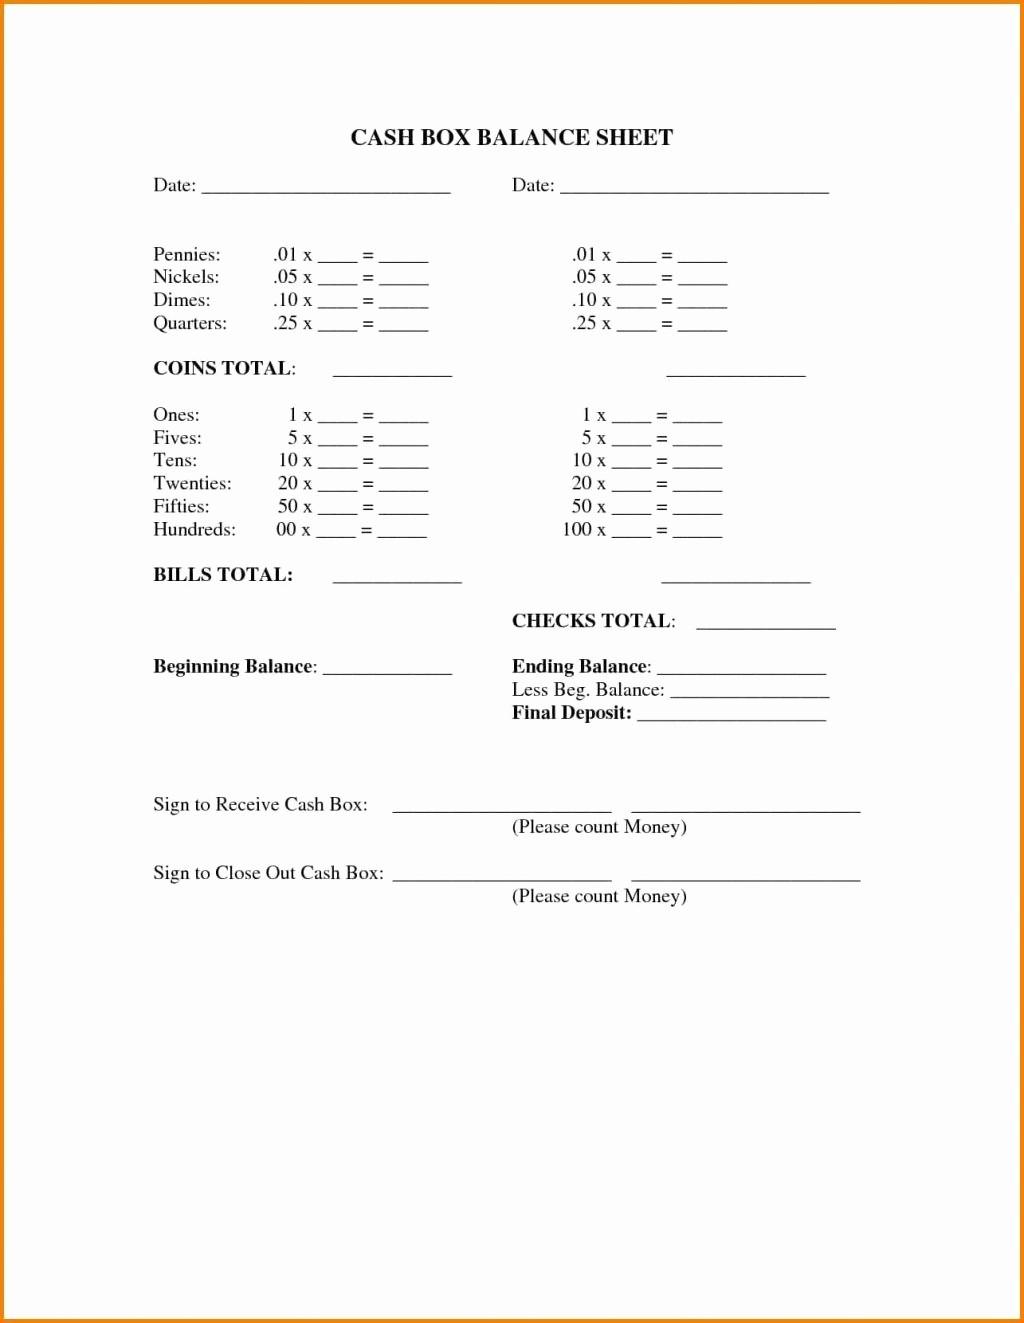 Cash Drawer Balance Sheet Template Beautiful Bestof S Daily Cash